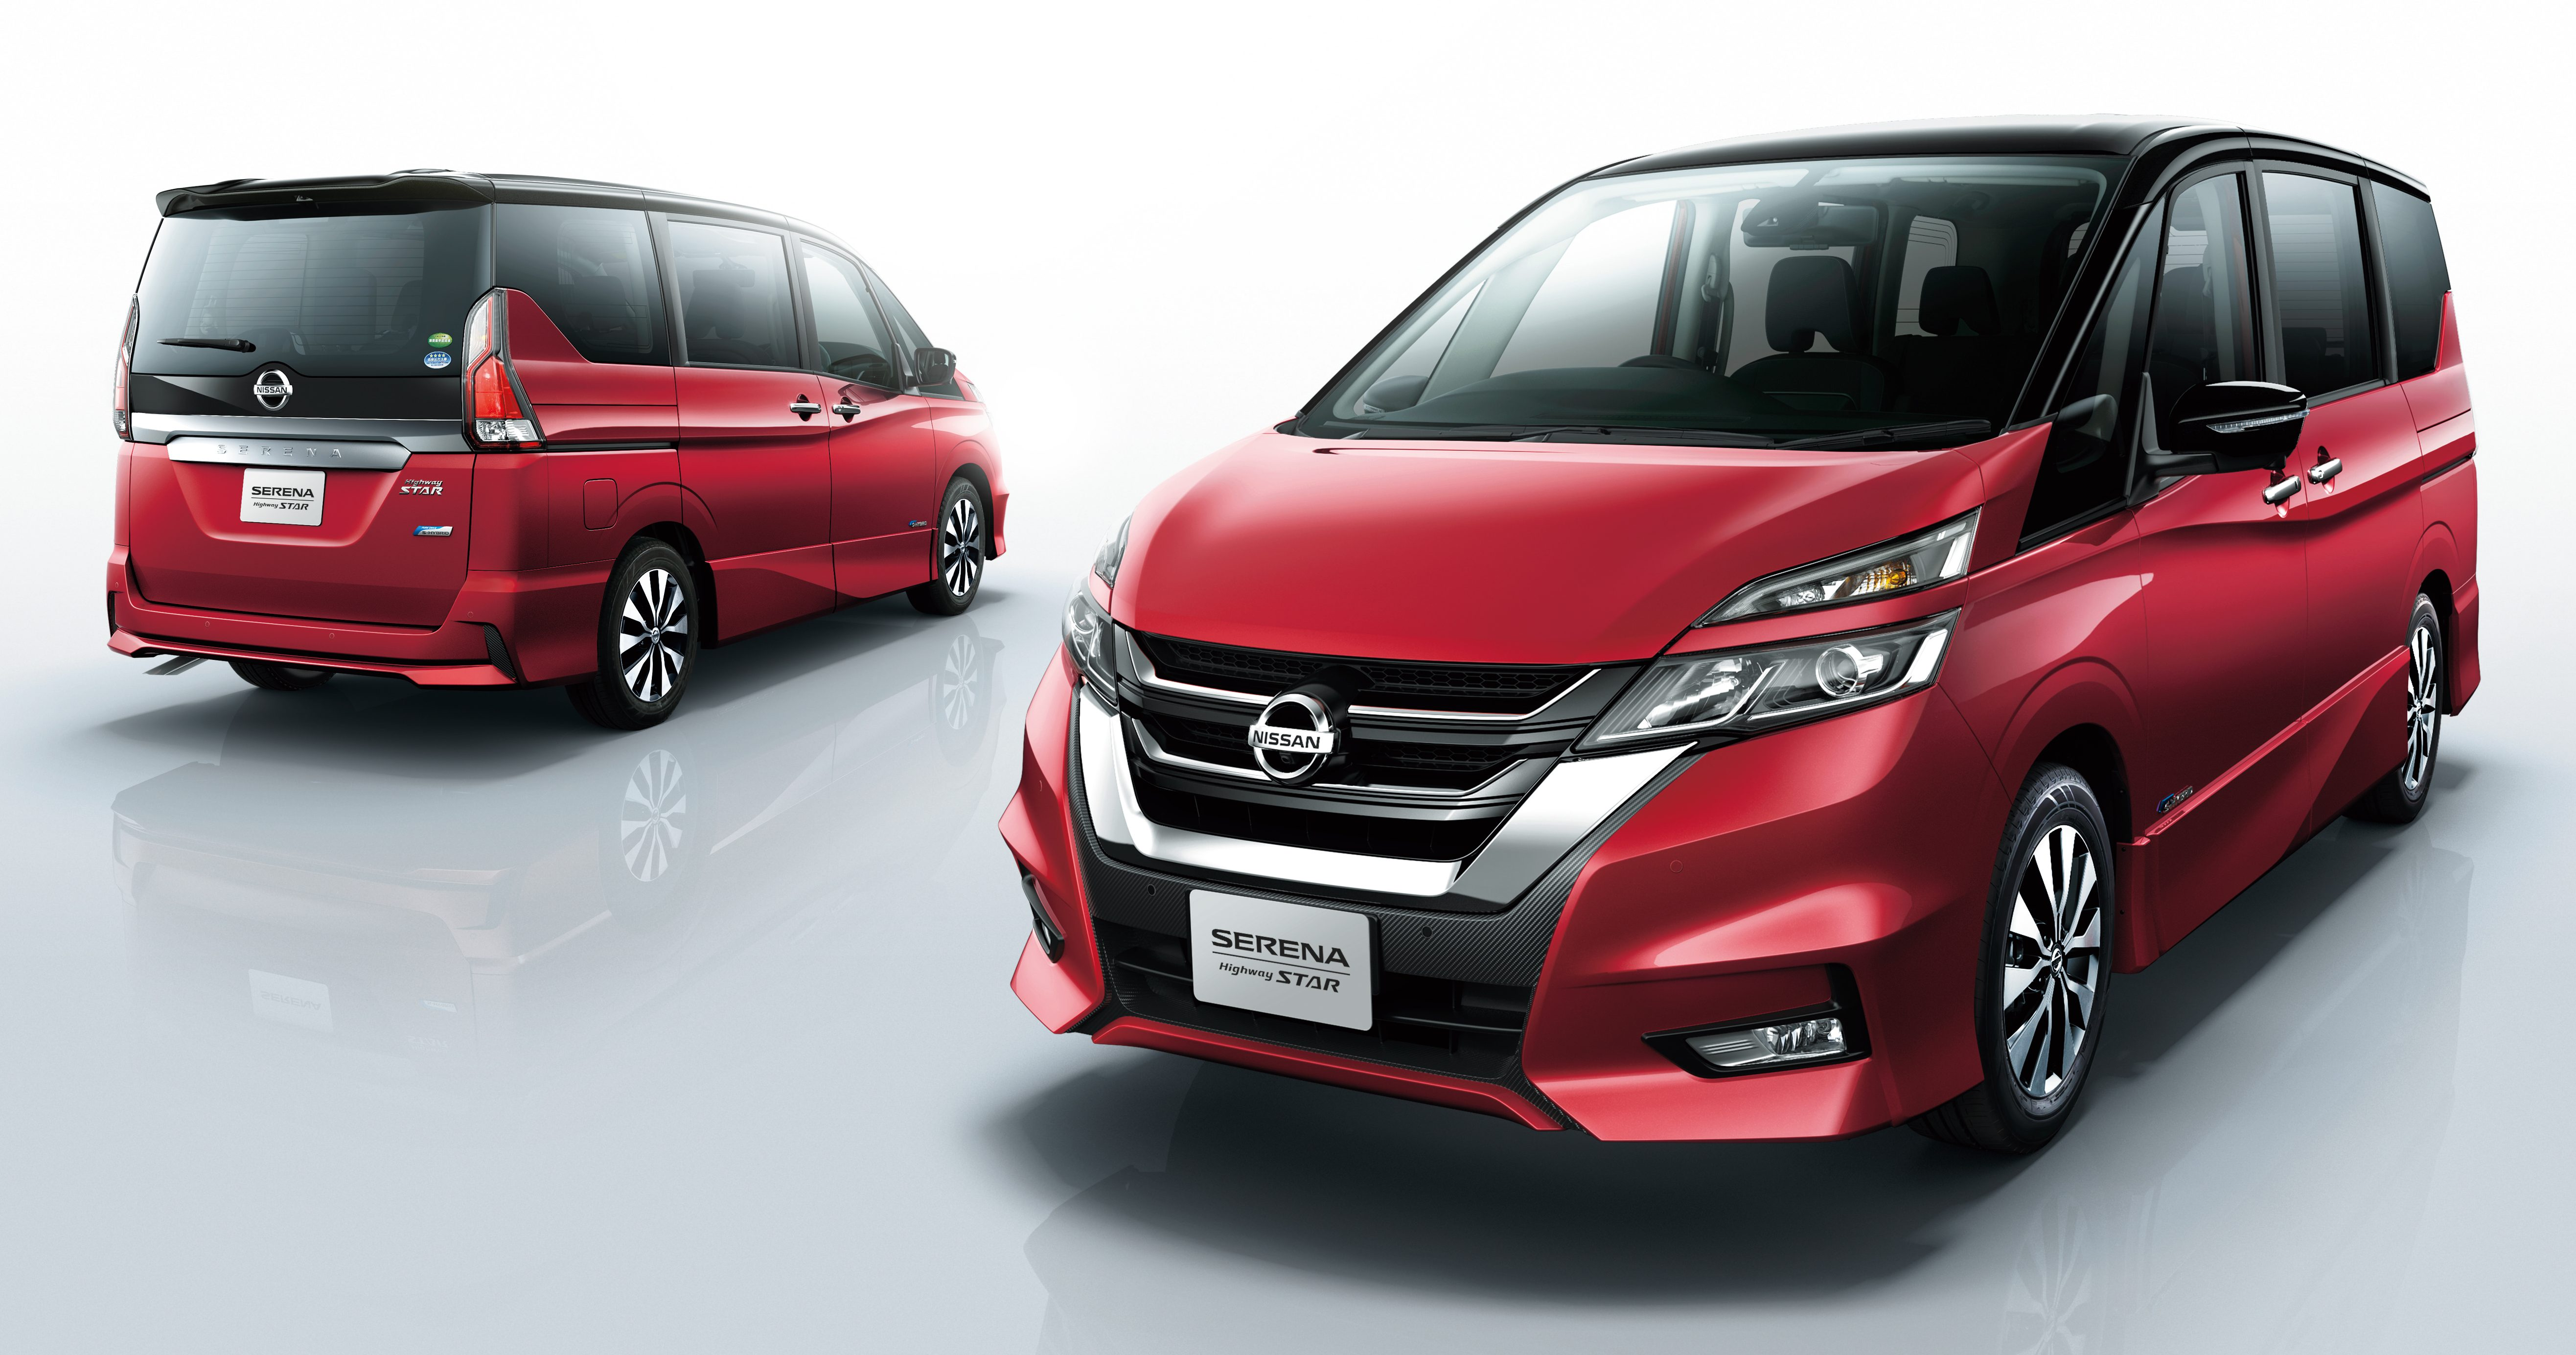 All New Nissan Serena Fifth Generation Model Debuts Paul Tan